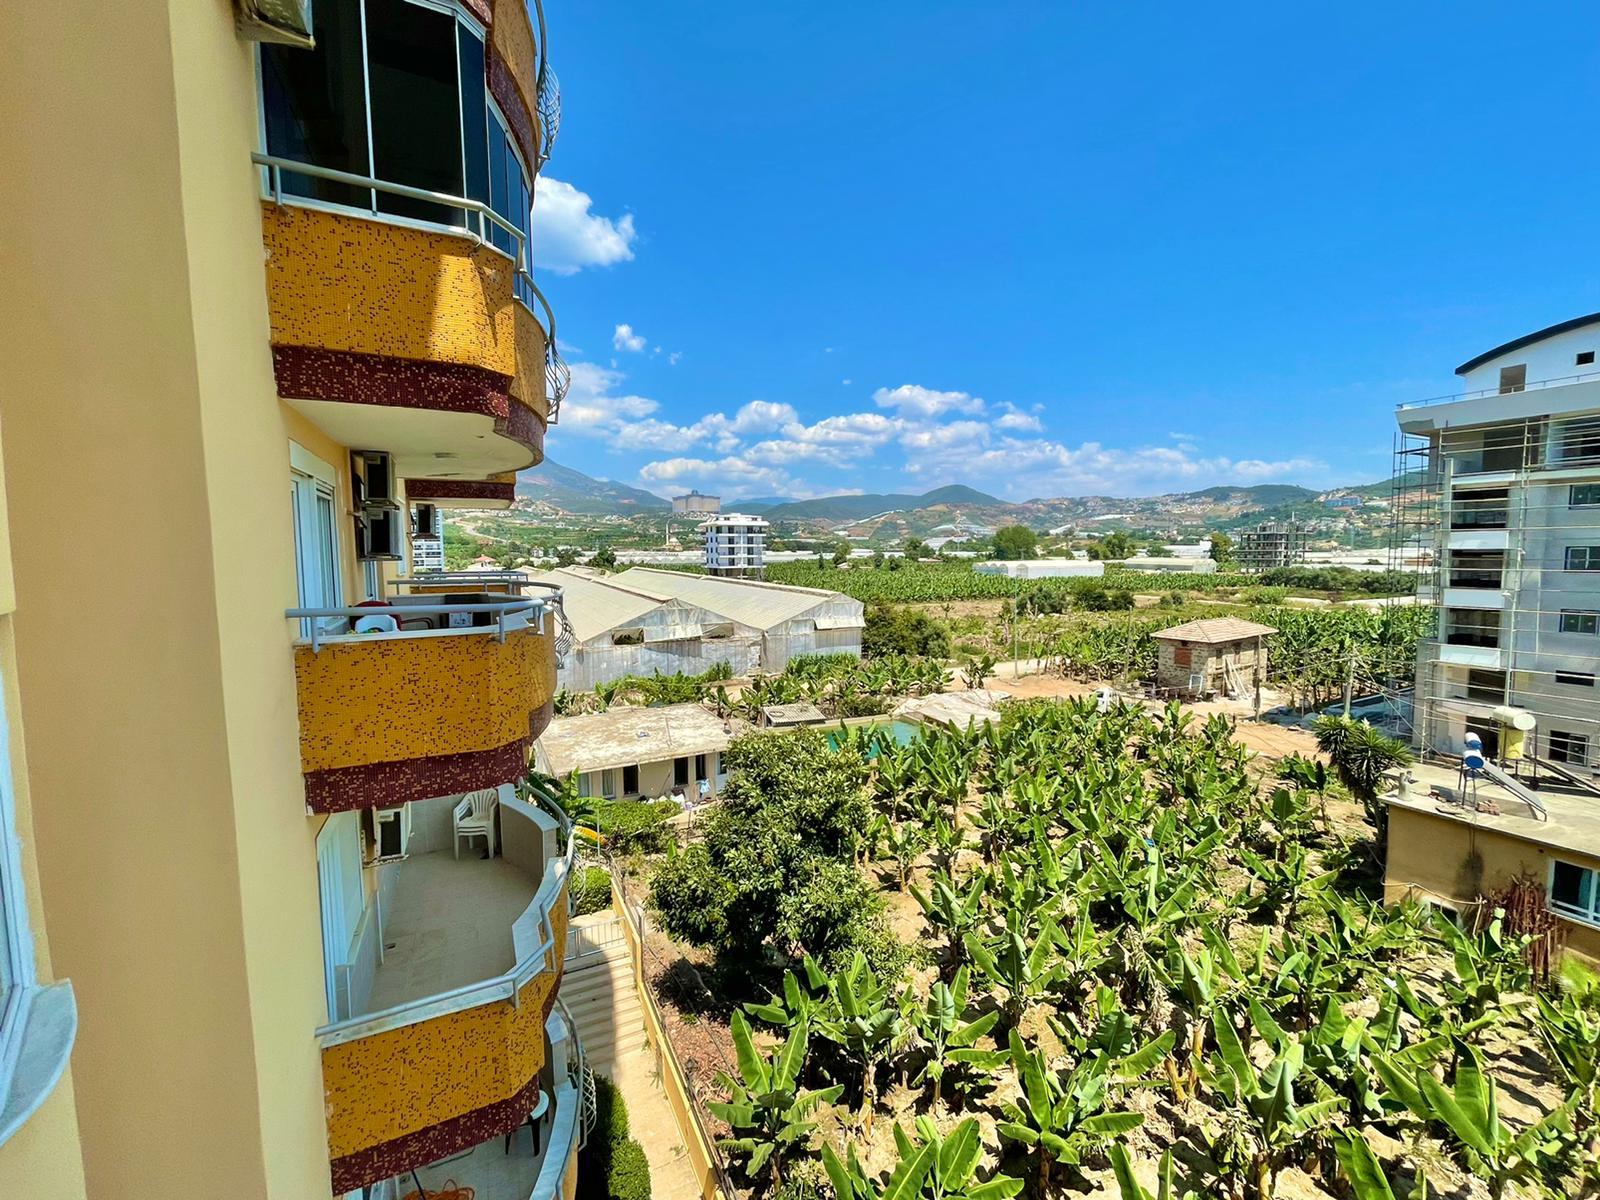 Трёхкомнатная квартира в «двух шагах» от Средиземного моря - Фото 24